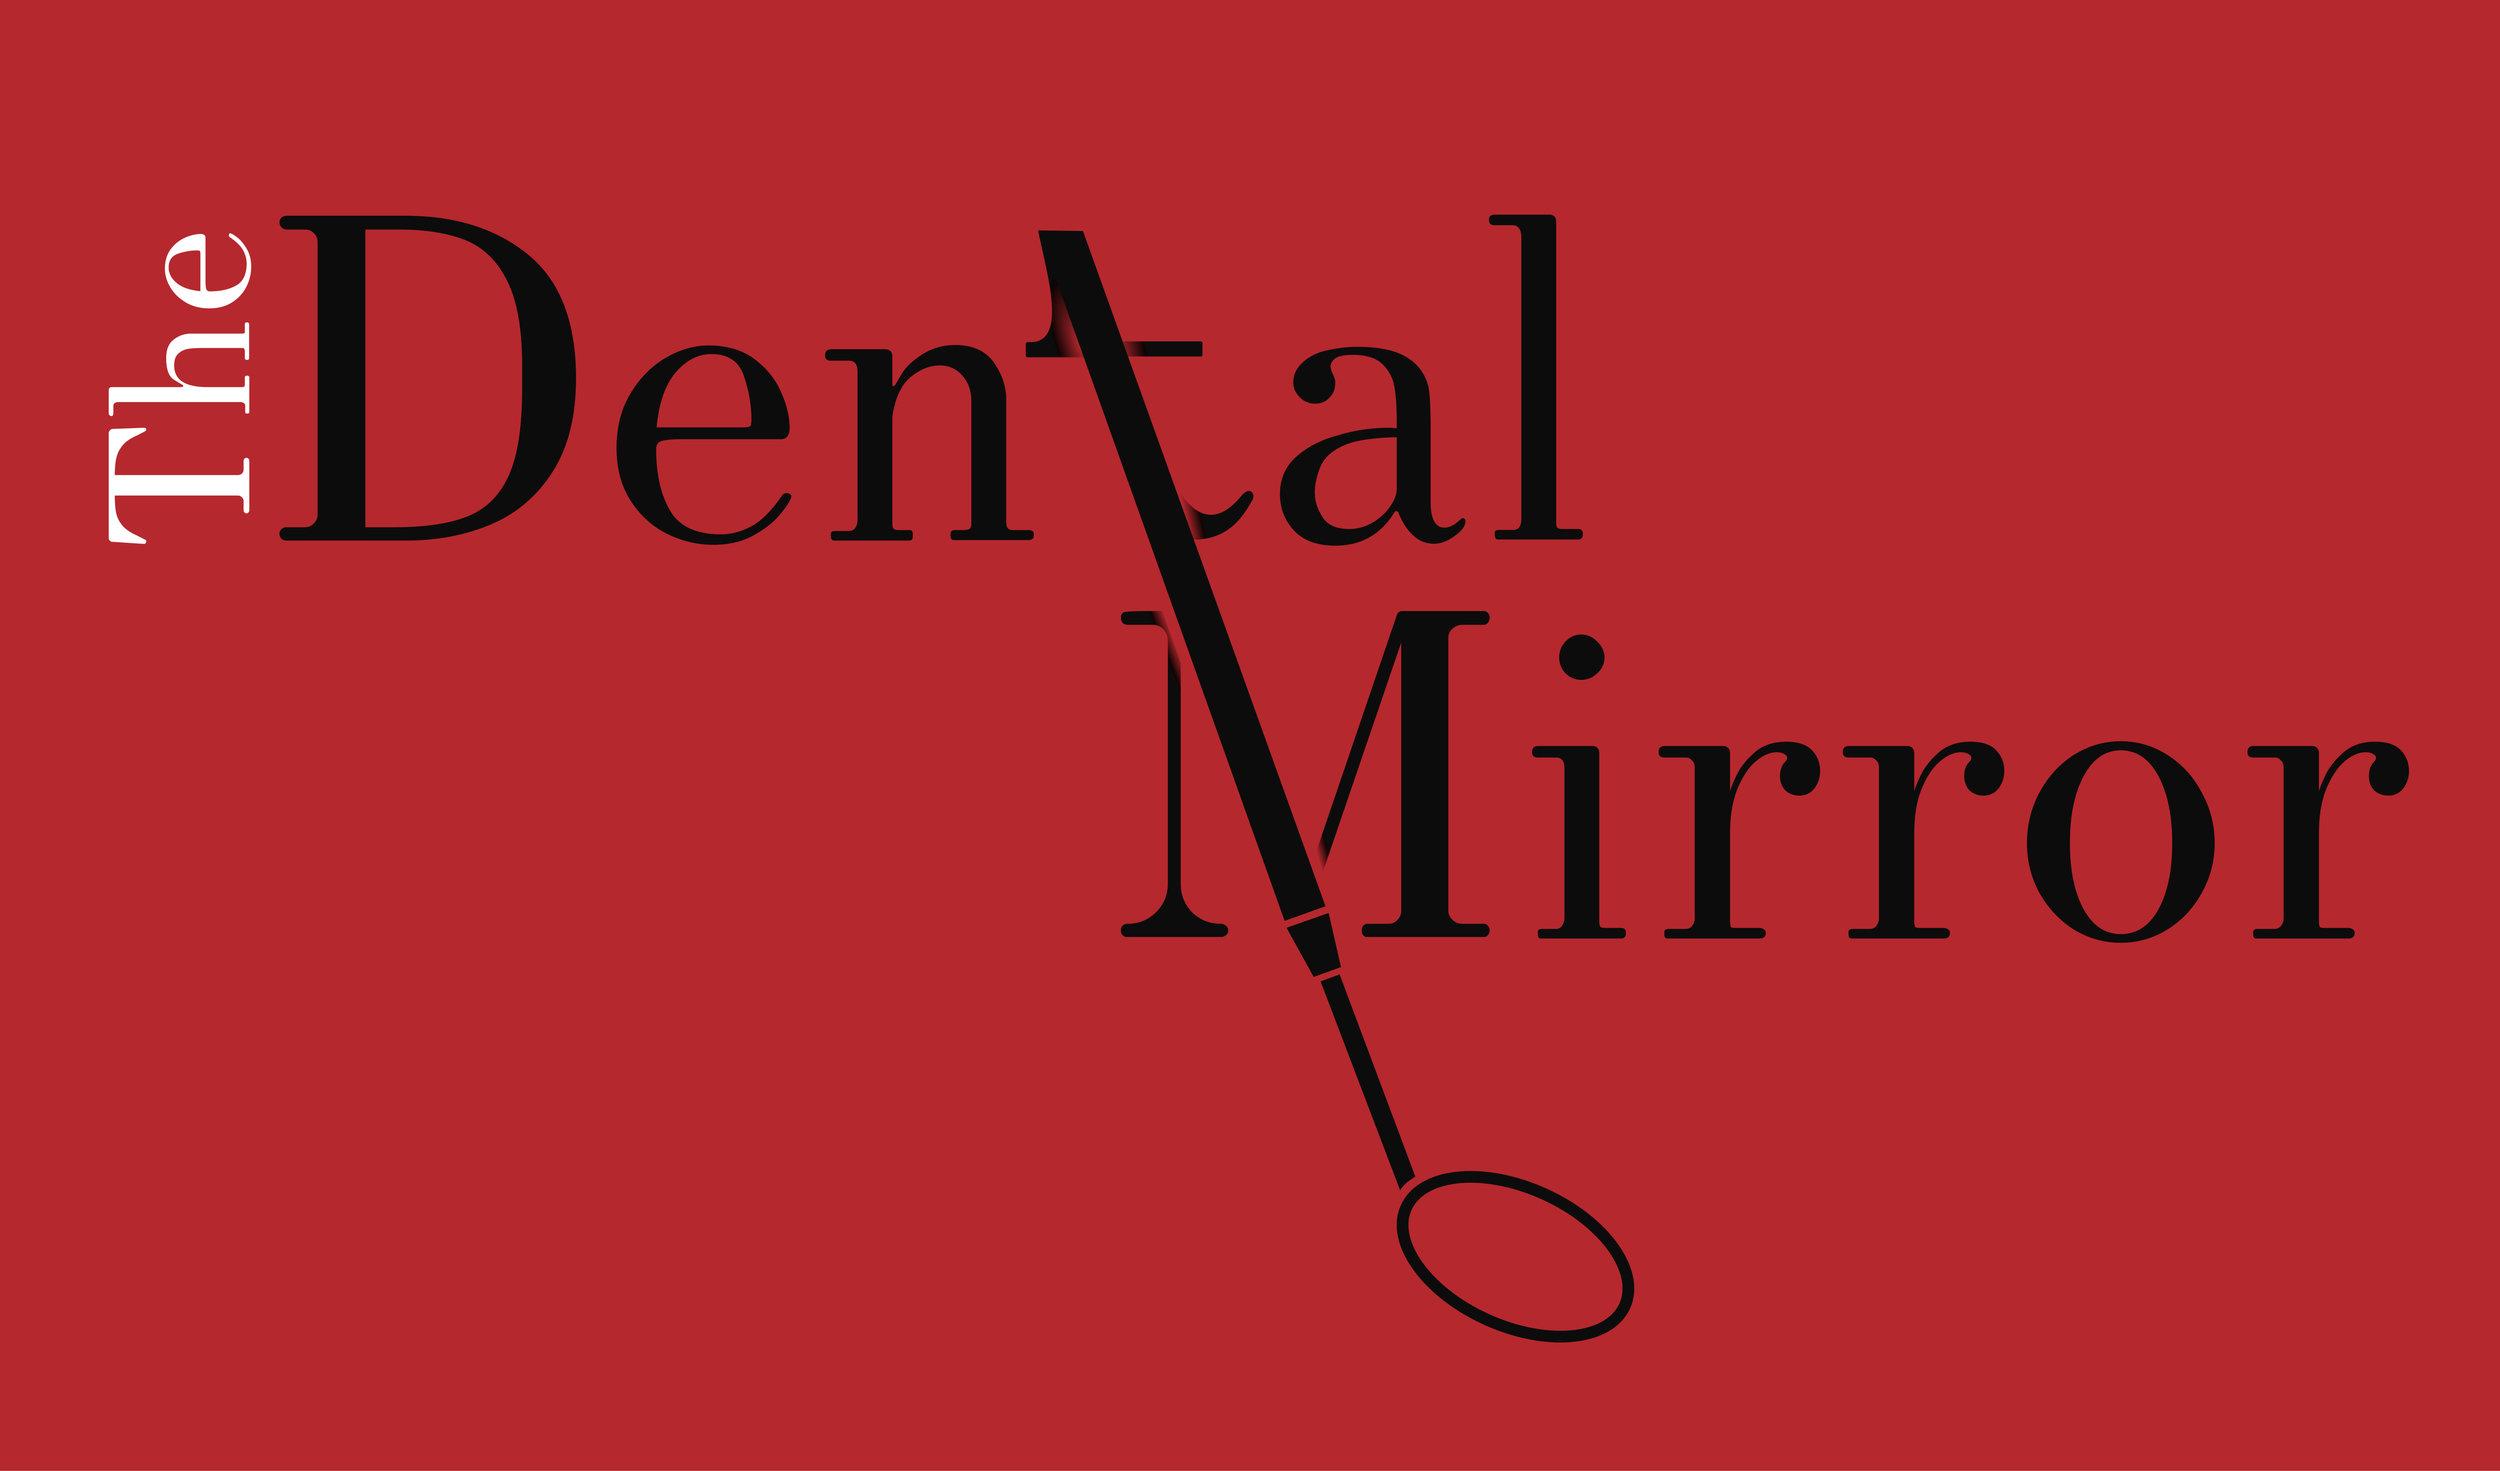 The Dental Mirror